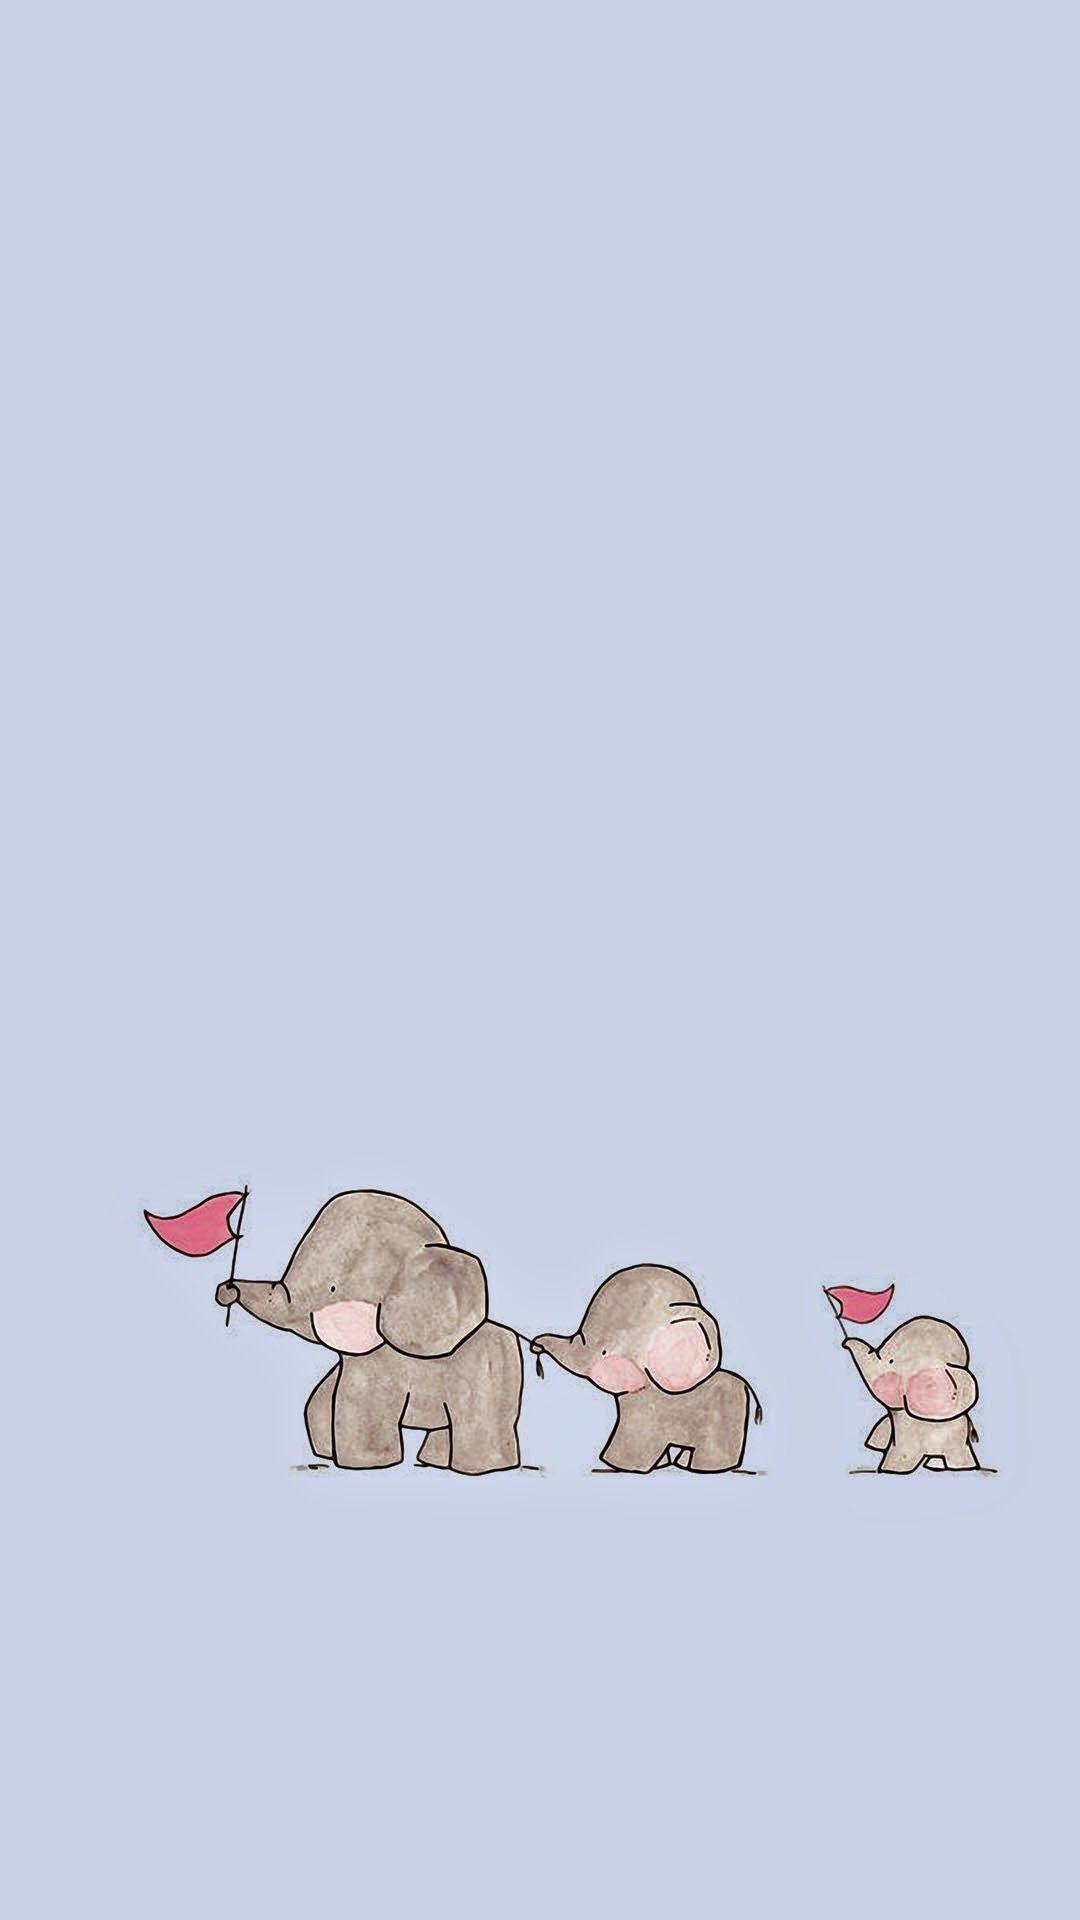 wallpaper elephant aesthetic vilma lii